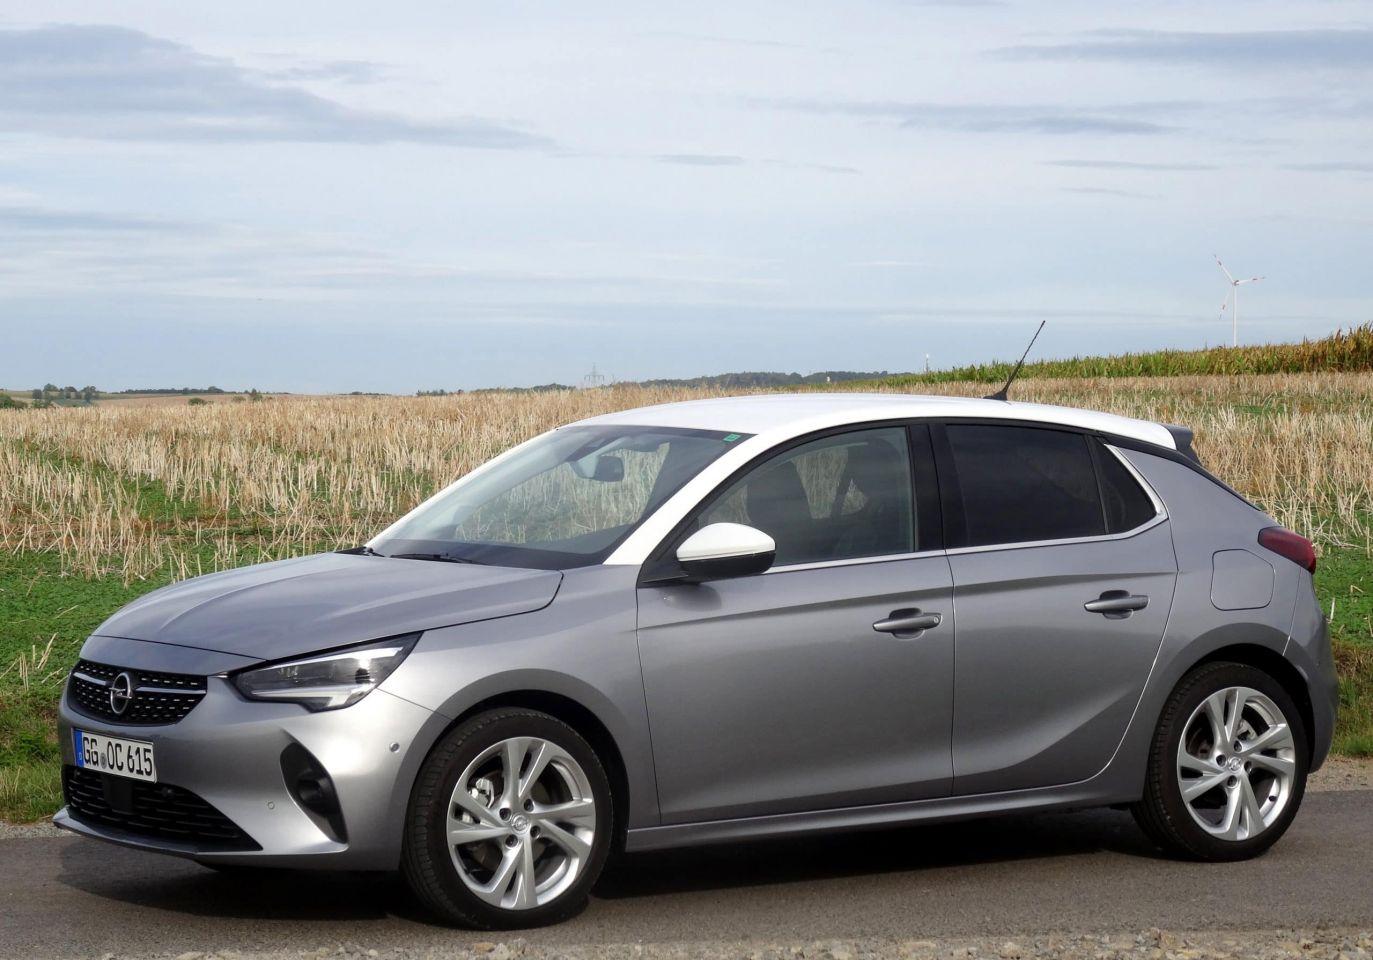 Opel Corsa 1.2 Direct Turbo